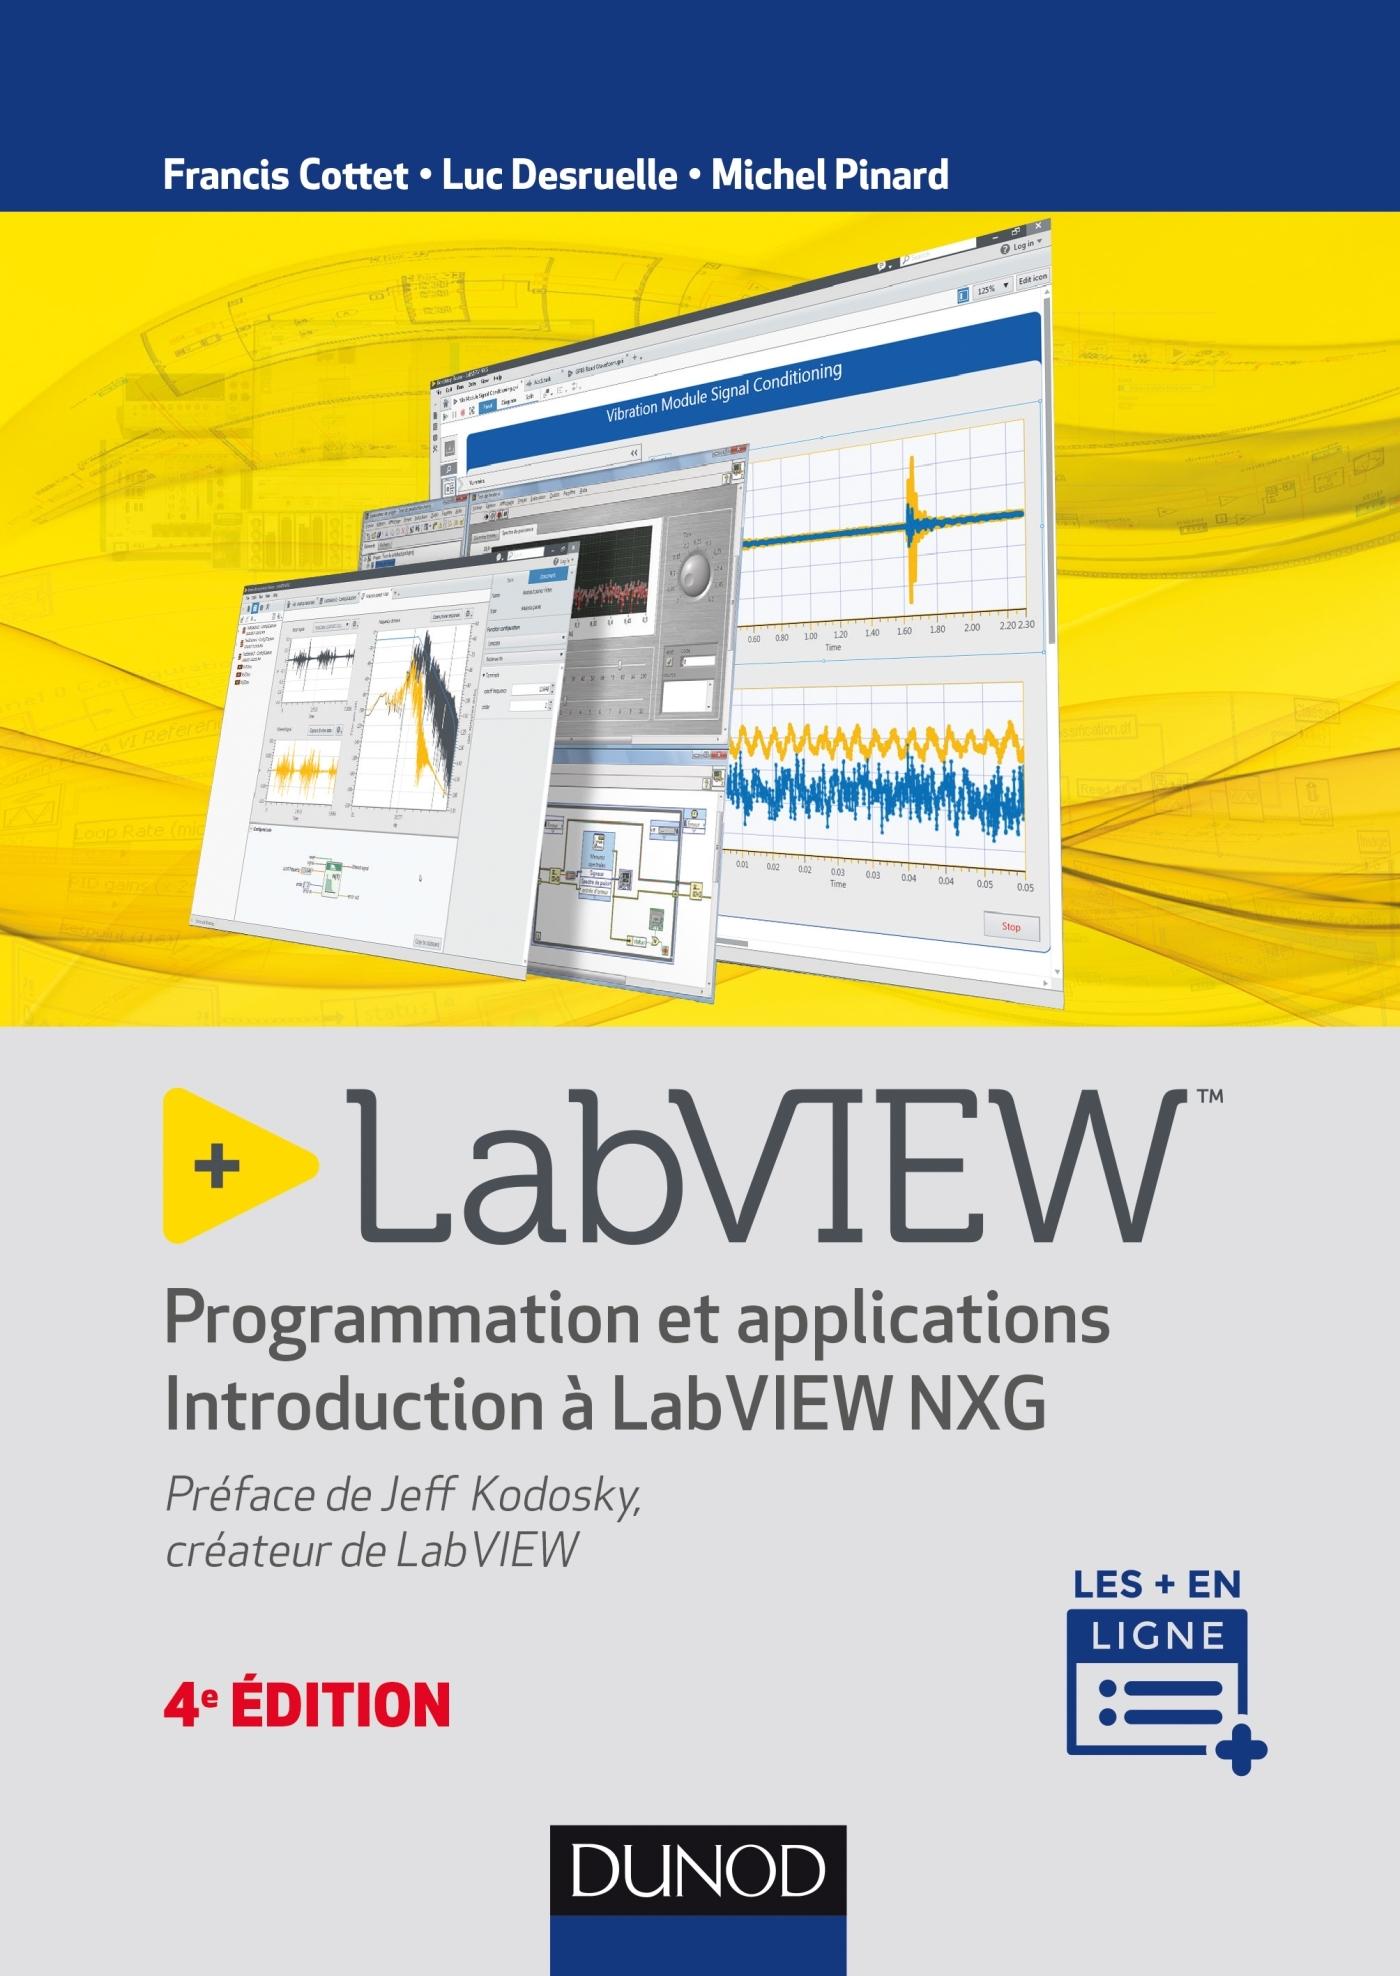 LABVIEW - 4E ED. - PROGRAMMATION ET APPLICATIONS - INTRODUCTION A LABVIEW NXG